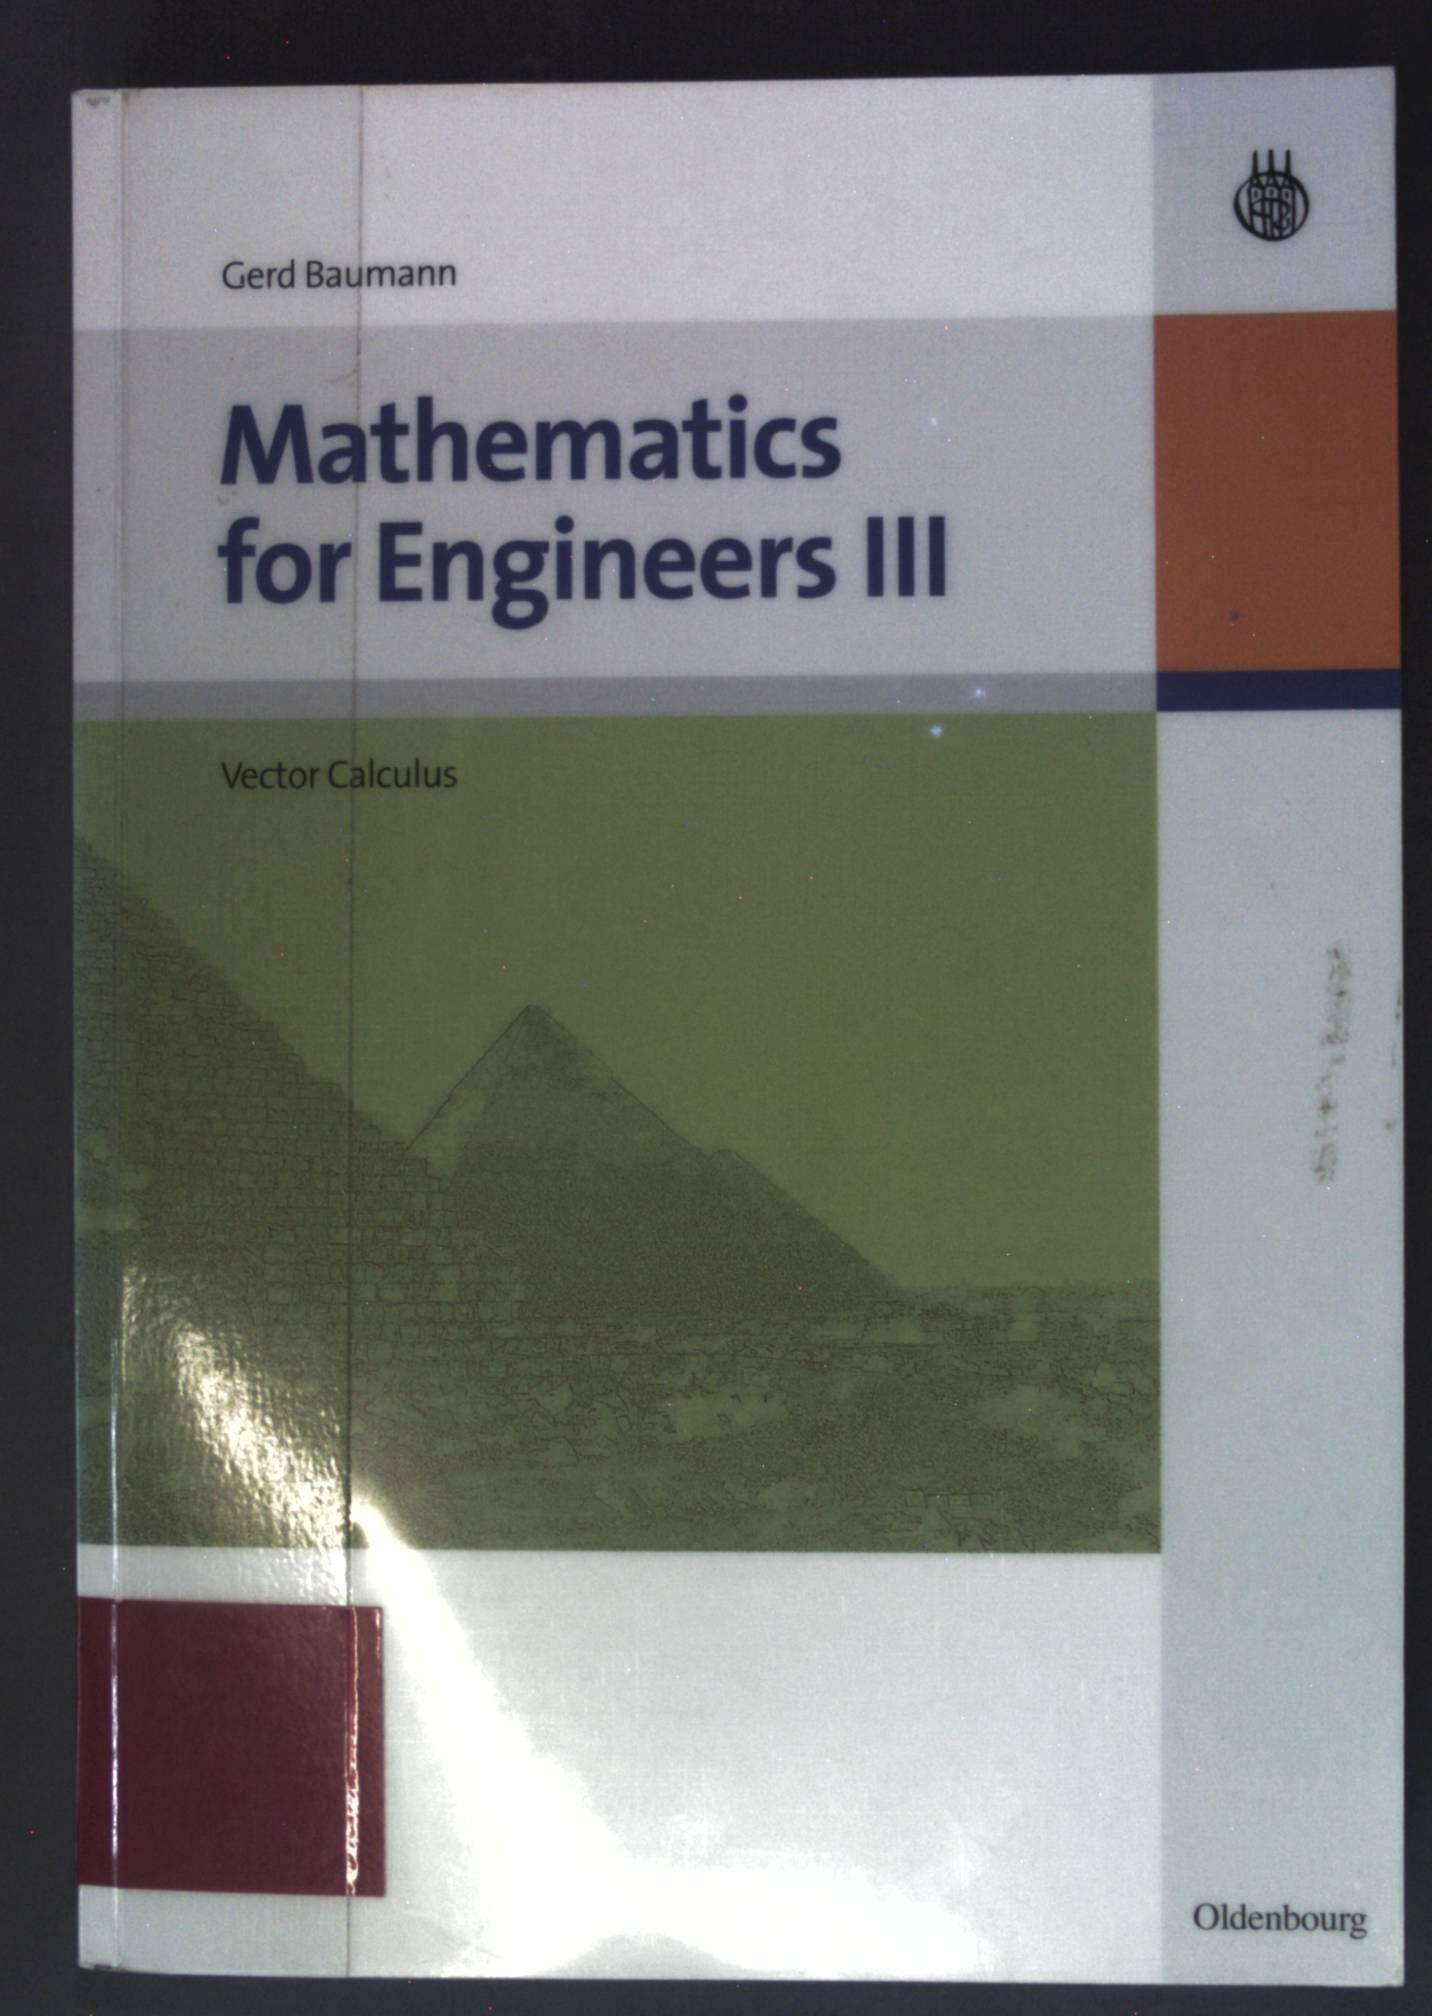 Mathematics for Engineers III: Vector Calculus: Baumann, Gerd: